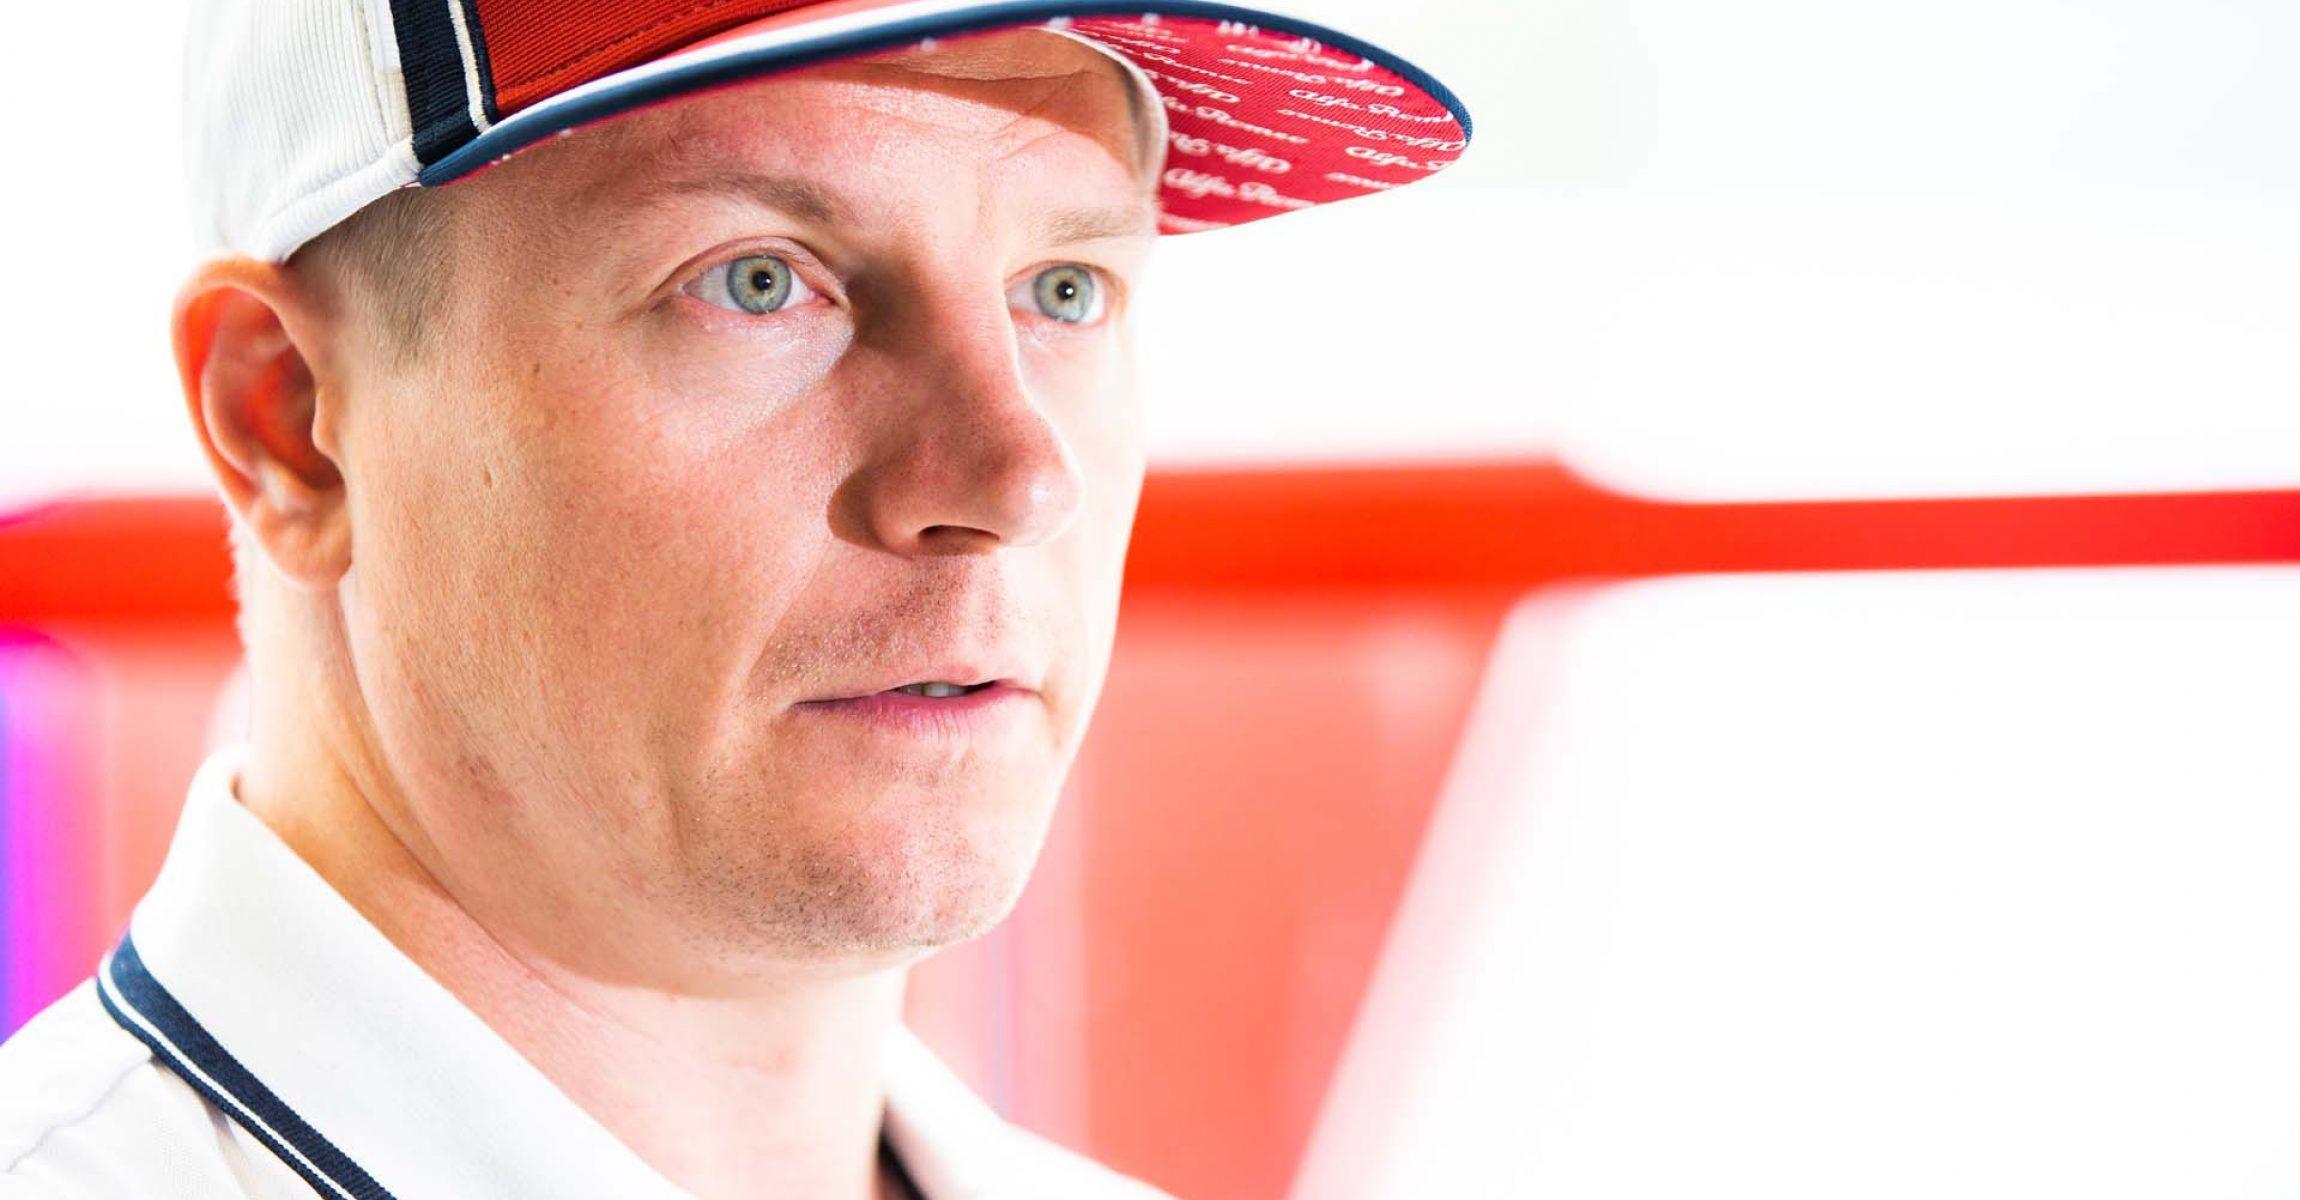 RAIKKONEN Kimi Räikkönen (fin), Alfa Romeo Racing C38, portrait during the 2019 Formula One World Championship, Brazil Grand Prix from November 15 to 17 in Sao Paulo, Brazil - Photo Antonin Vincent / DPPI